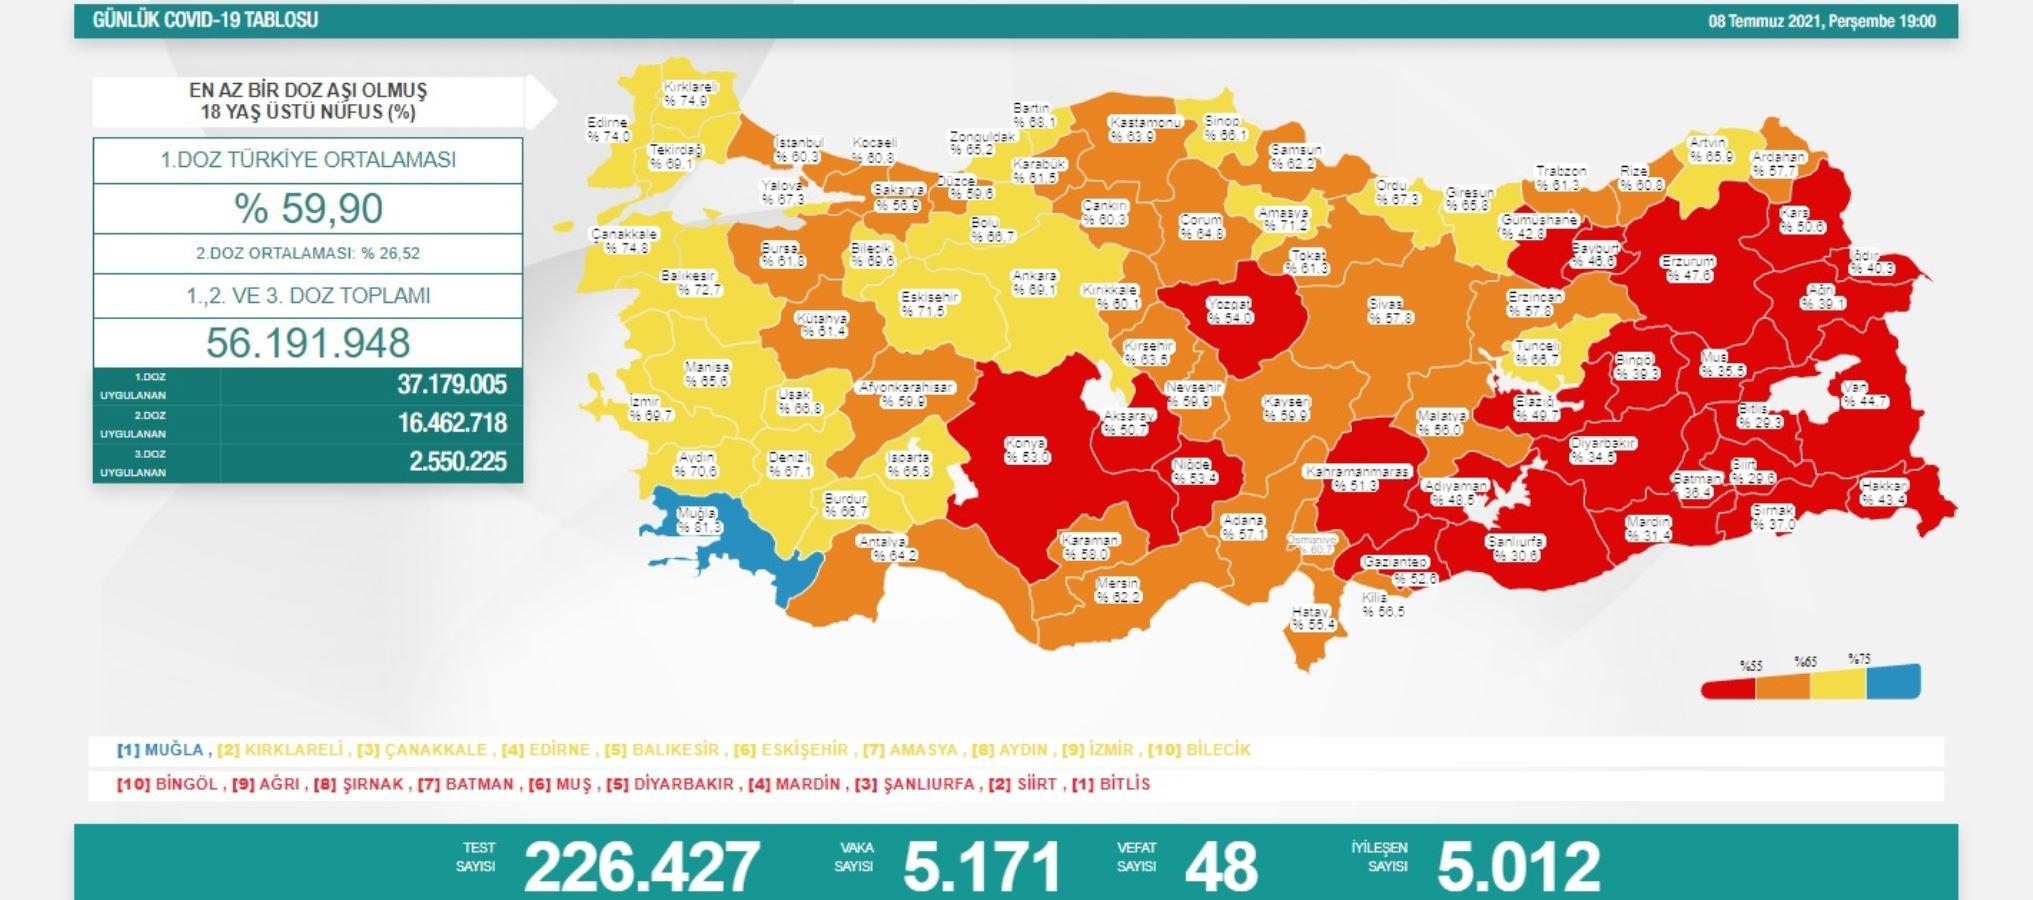 https://www.cumhuriyet.com.tr/Archive/2021/7/8/202930221-8-temmuz-vaka.jpg